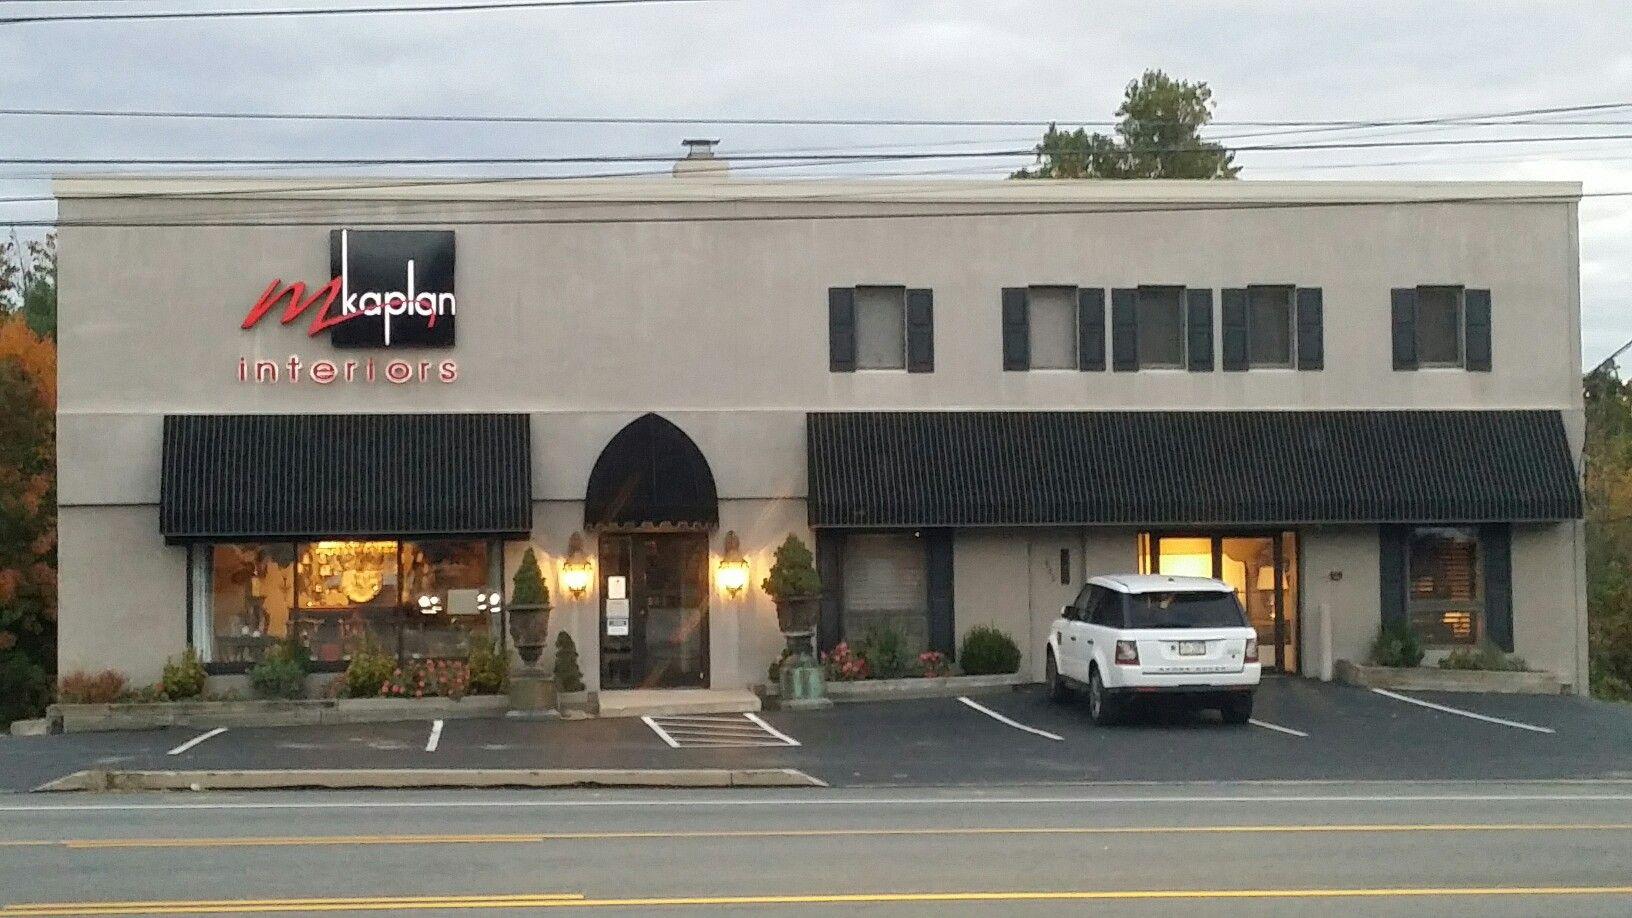 M Kaplan Interiors Showroom Malvern PA 610 695 6363 Www.MKaplanInteriors.com